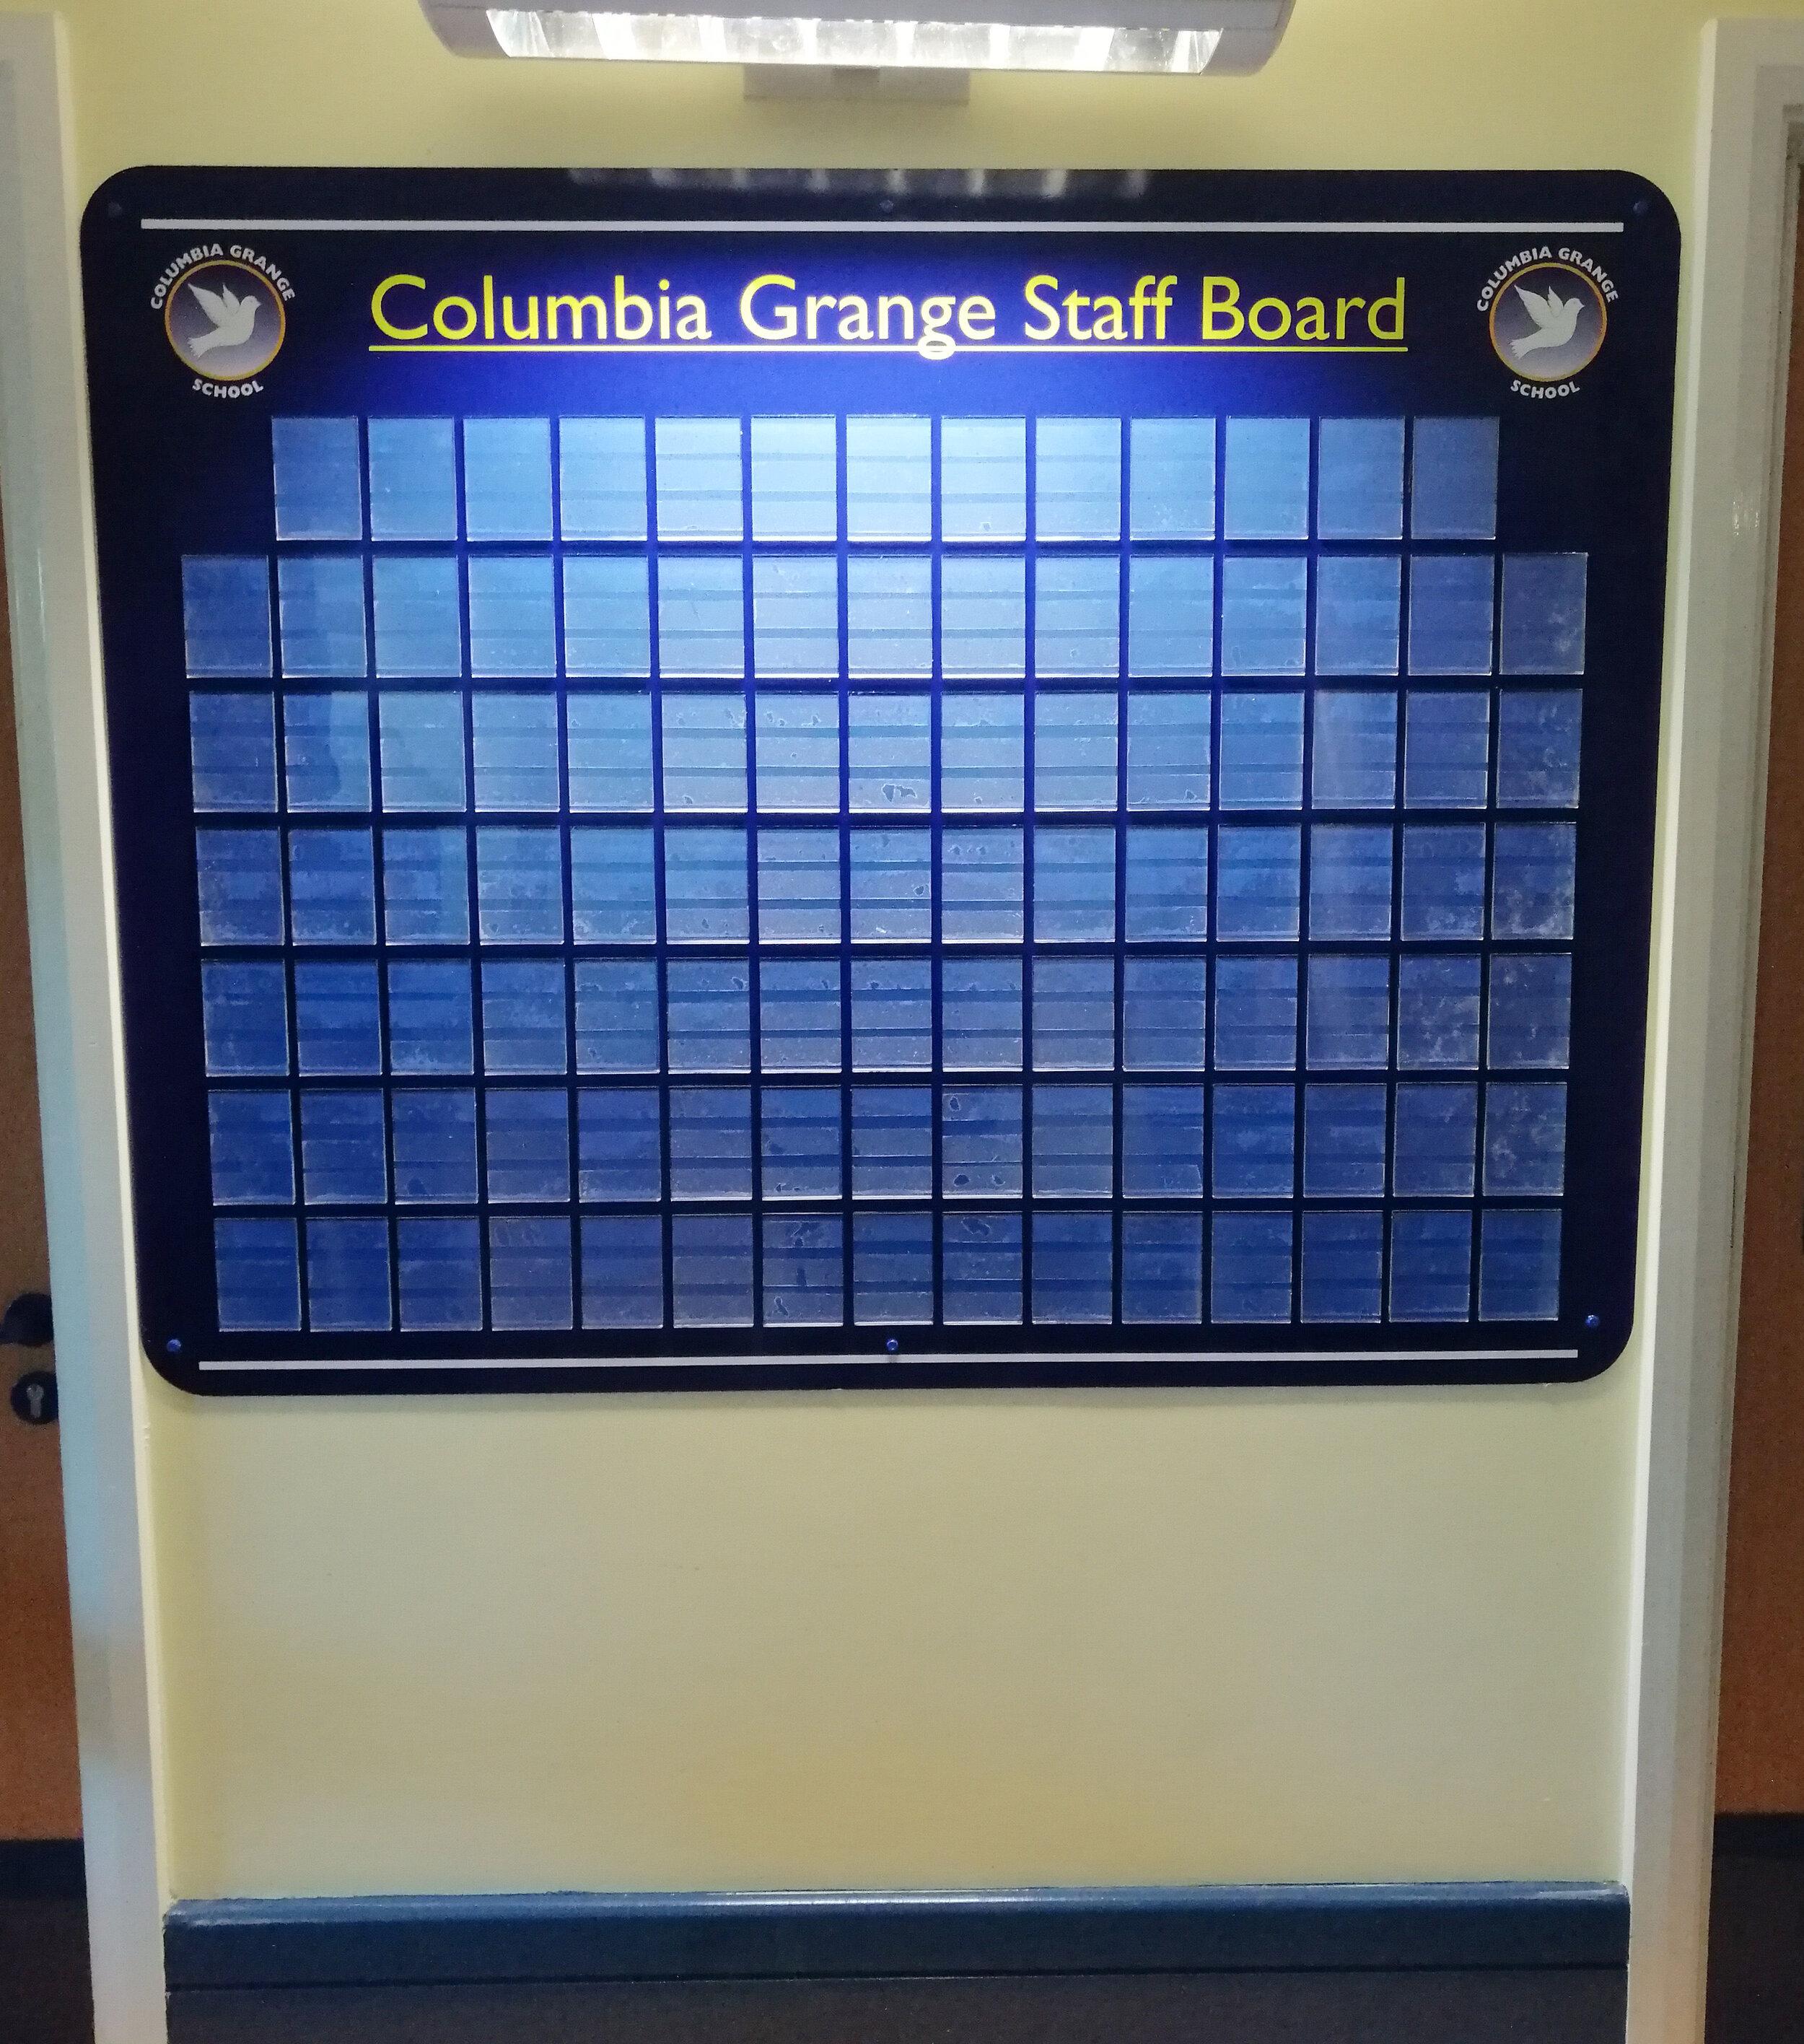 Columbia Grange Staff Board